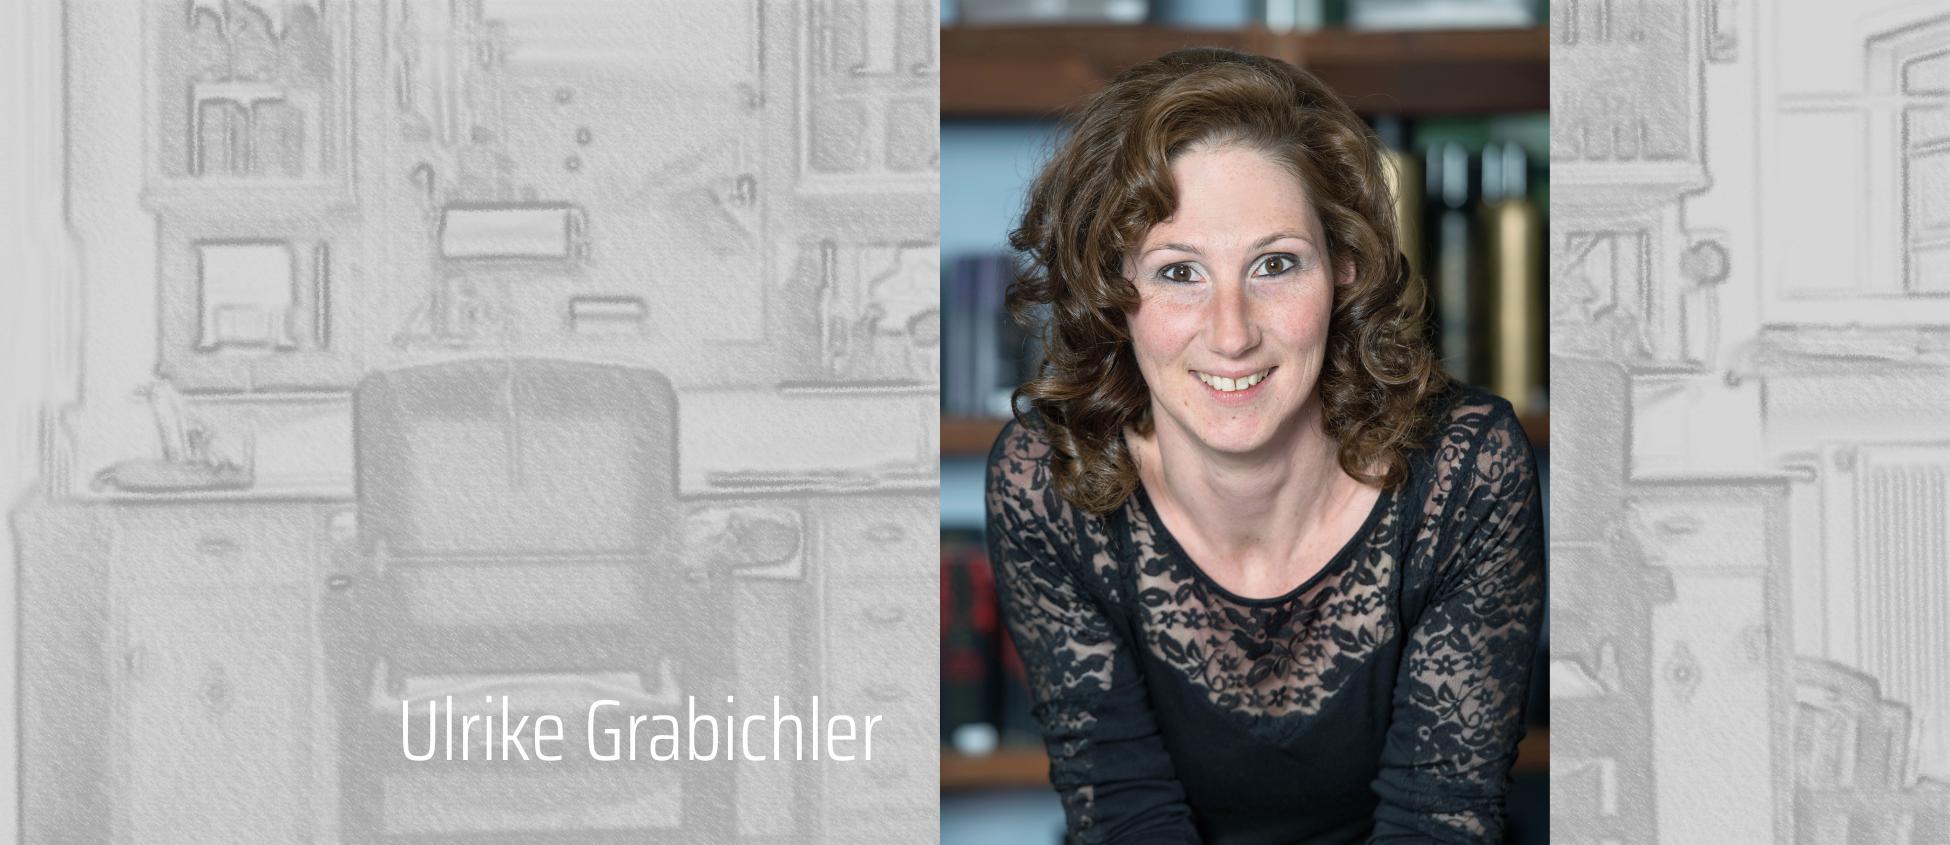 ulrike_grabichler